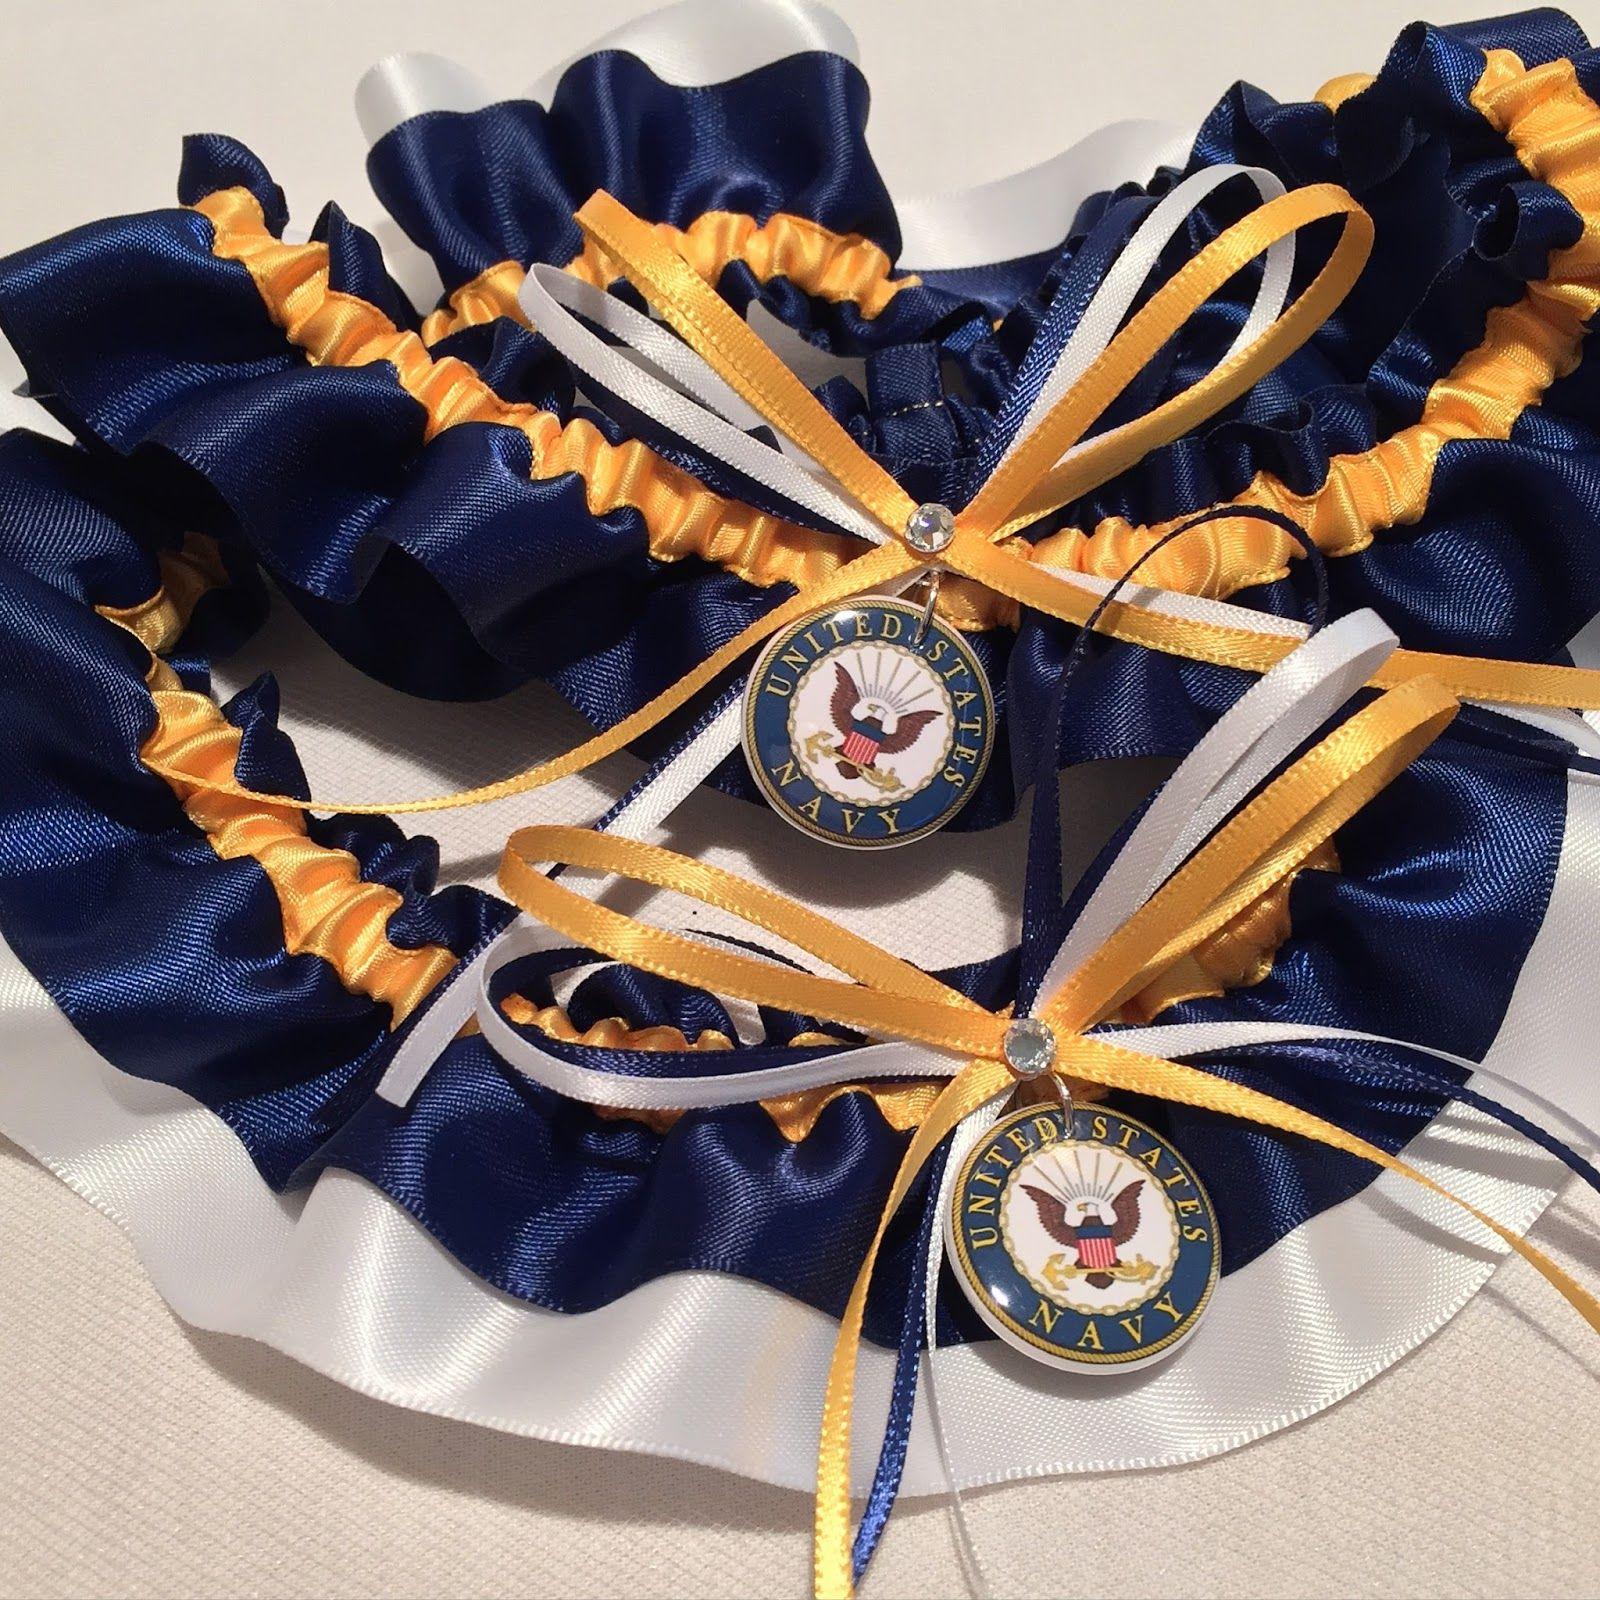 United States Navy Wedding Garters by Sugarplum Garters